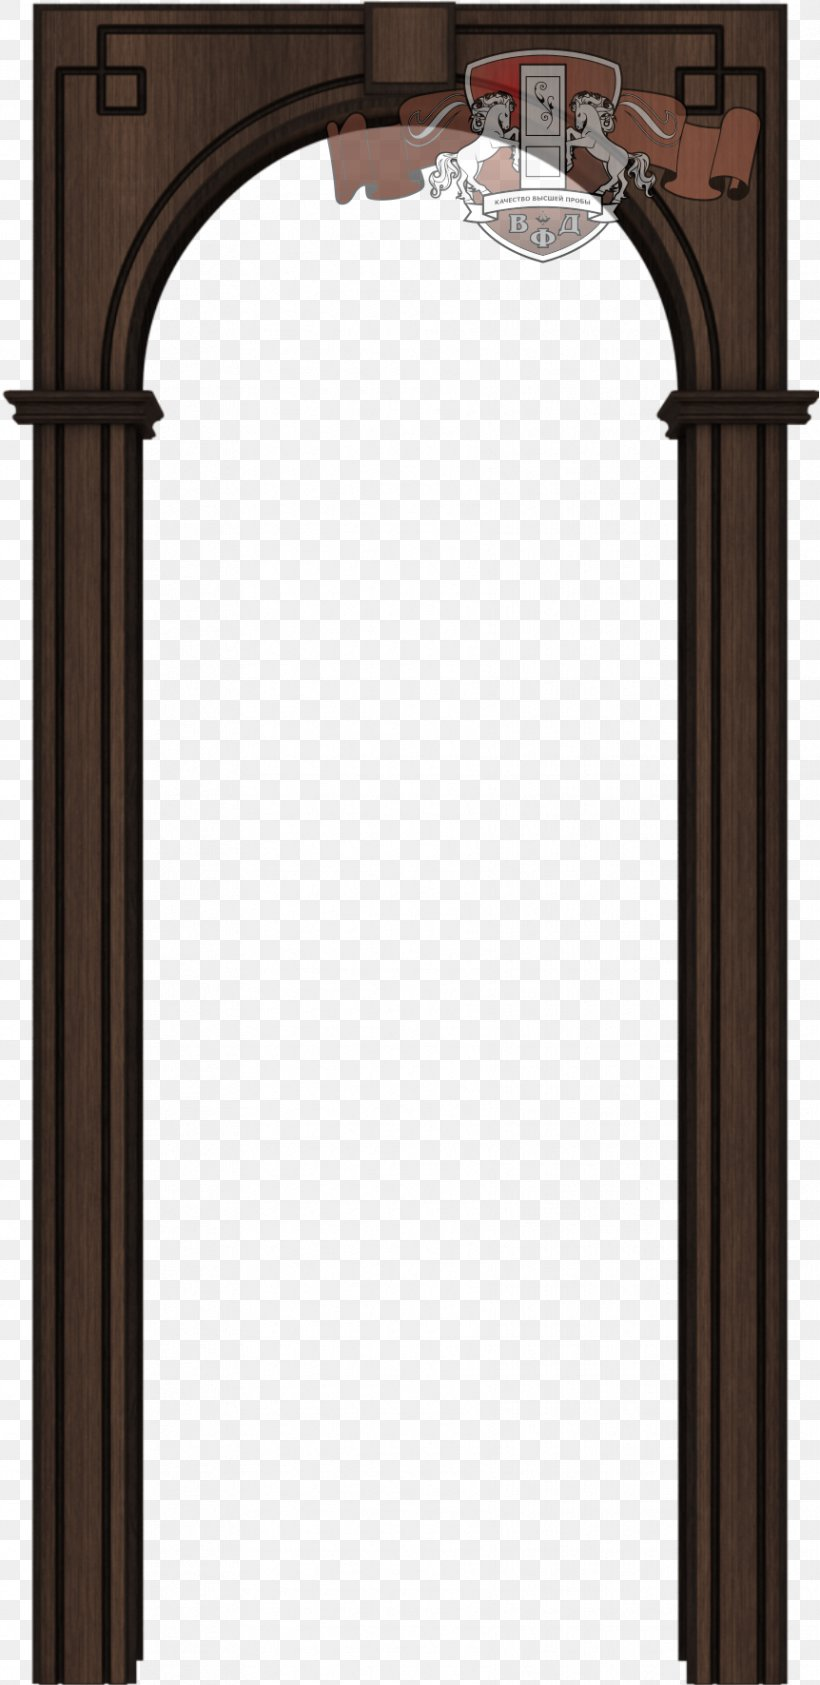 Arch Wood Veneer Door Medium Density Fibreboard Png